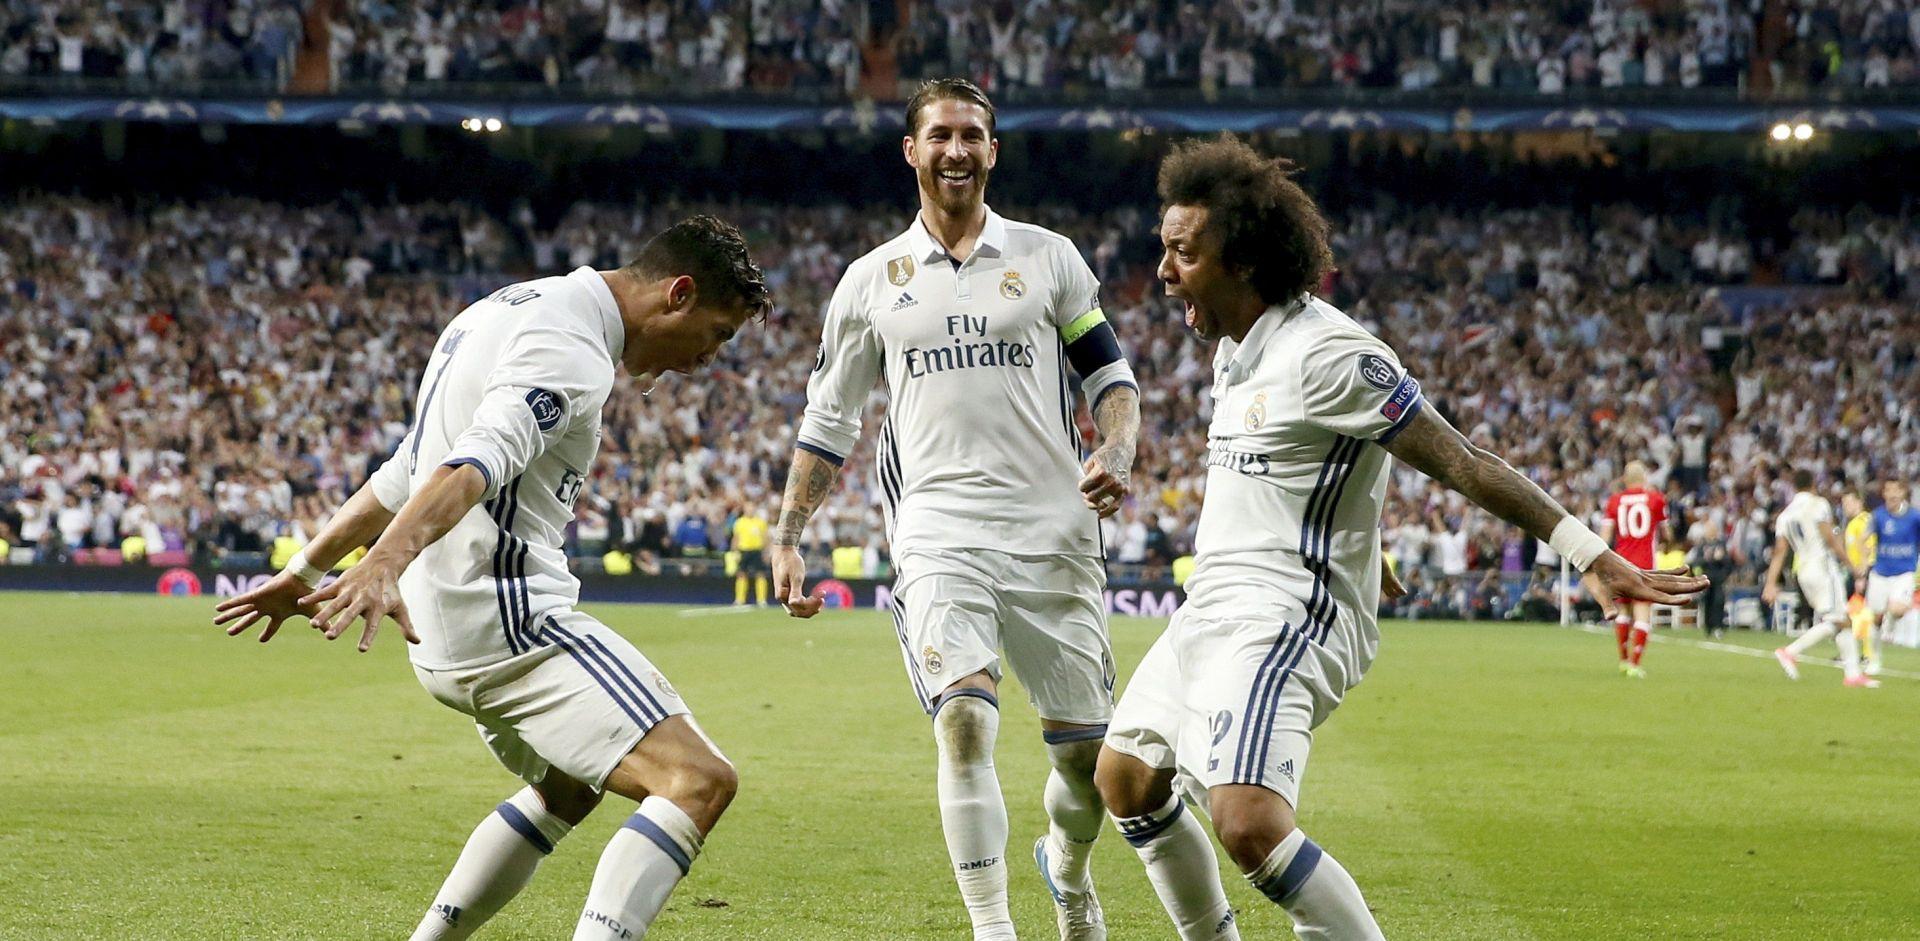 FOOTBALL LEAKS Milijarda eura od Adidasa za madridski Real